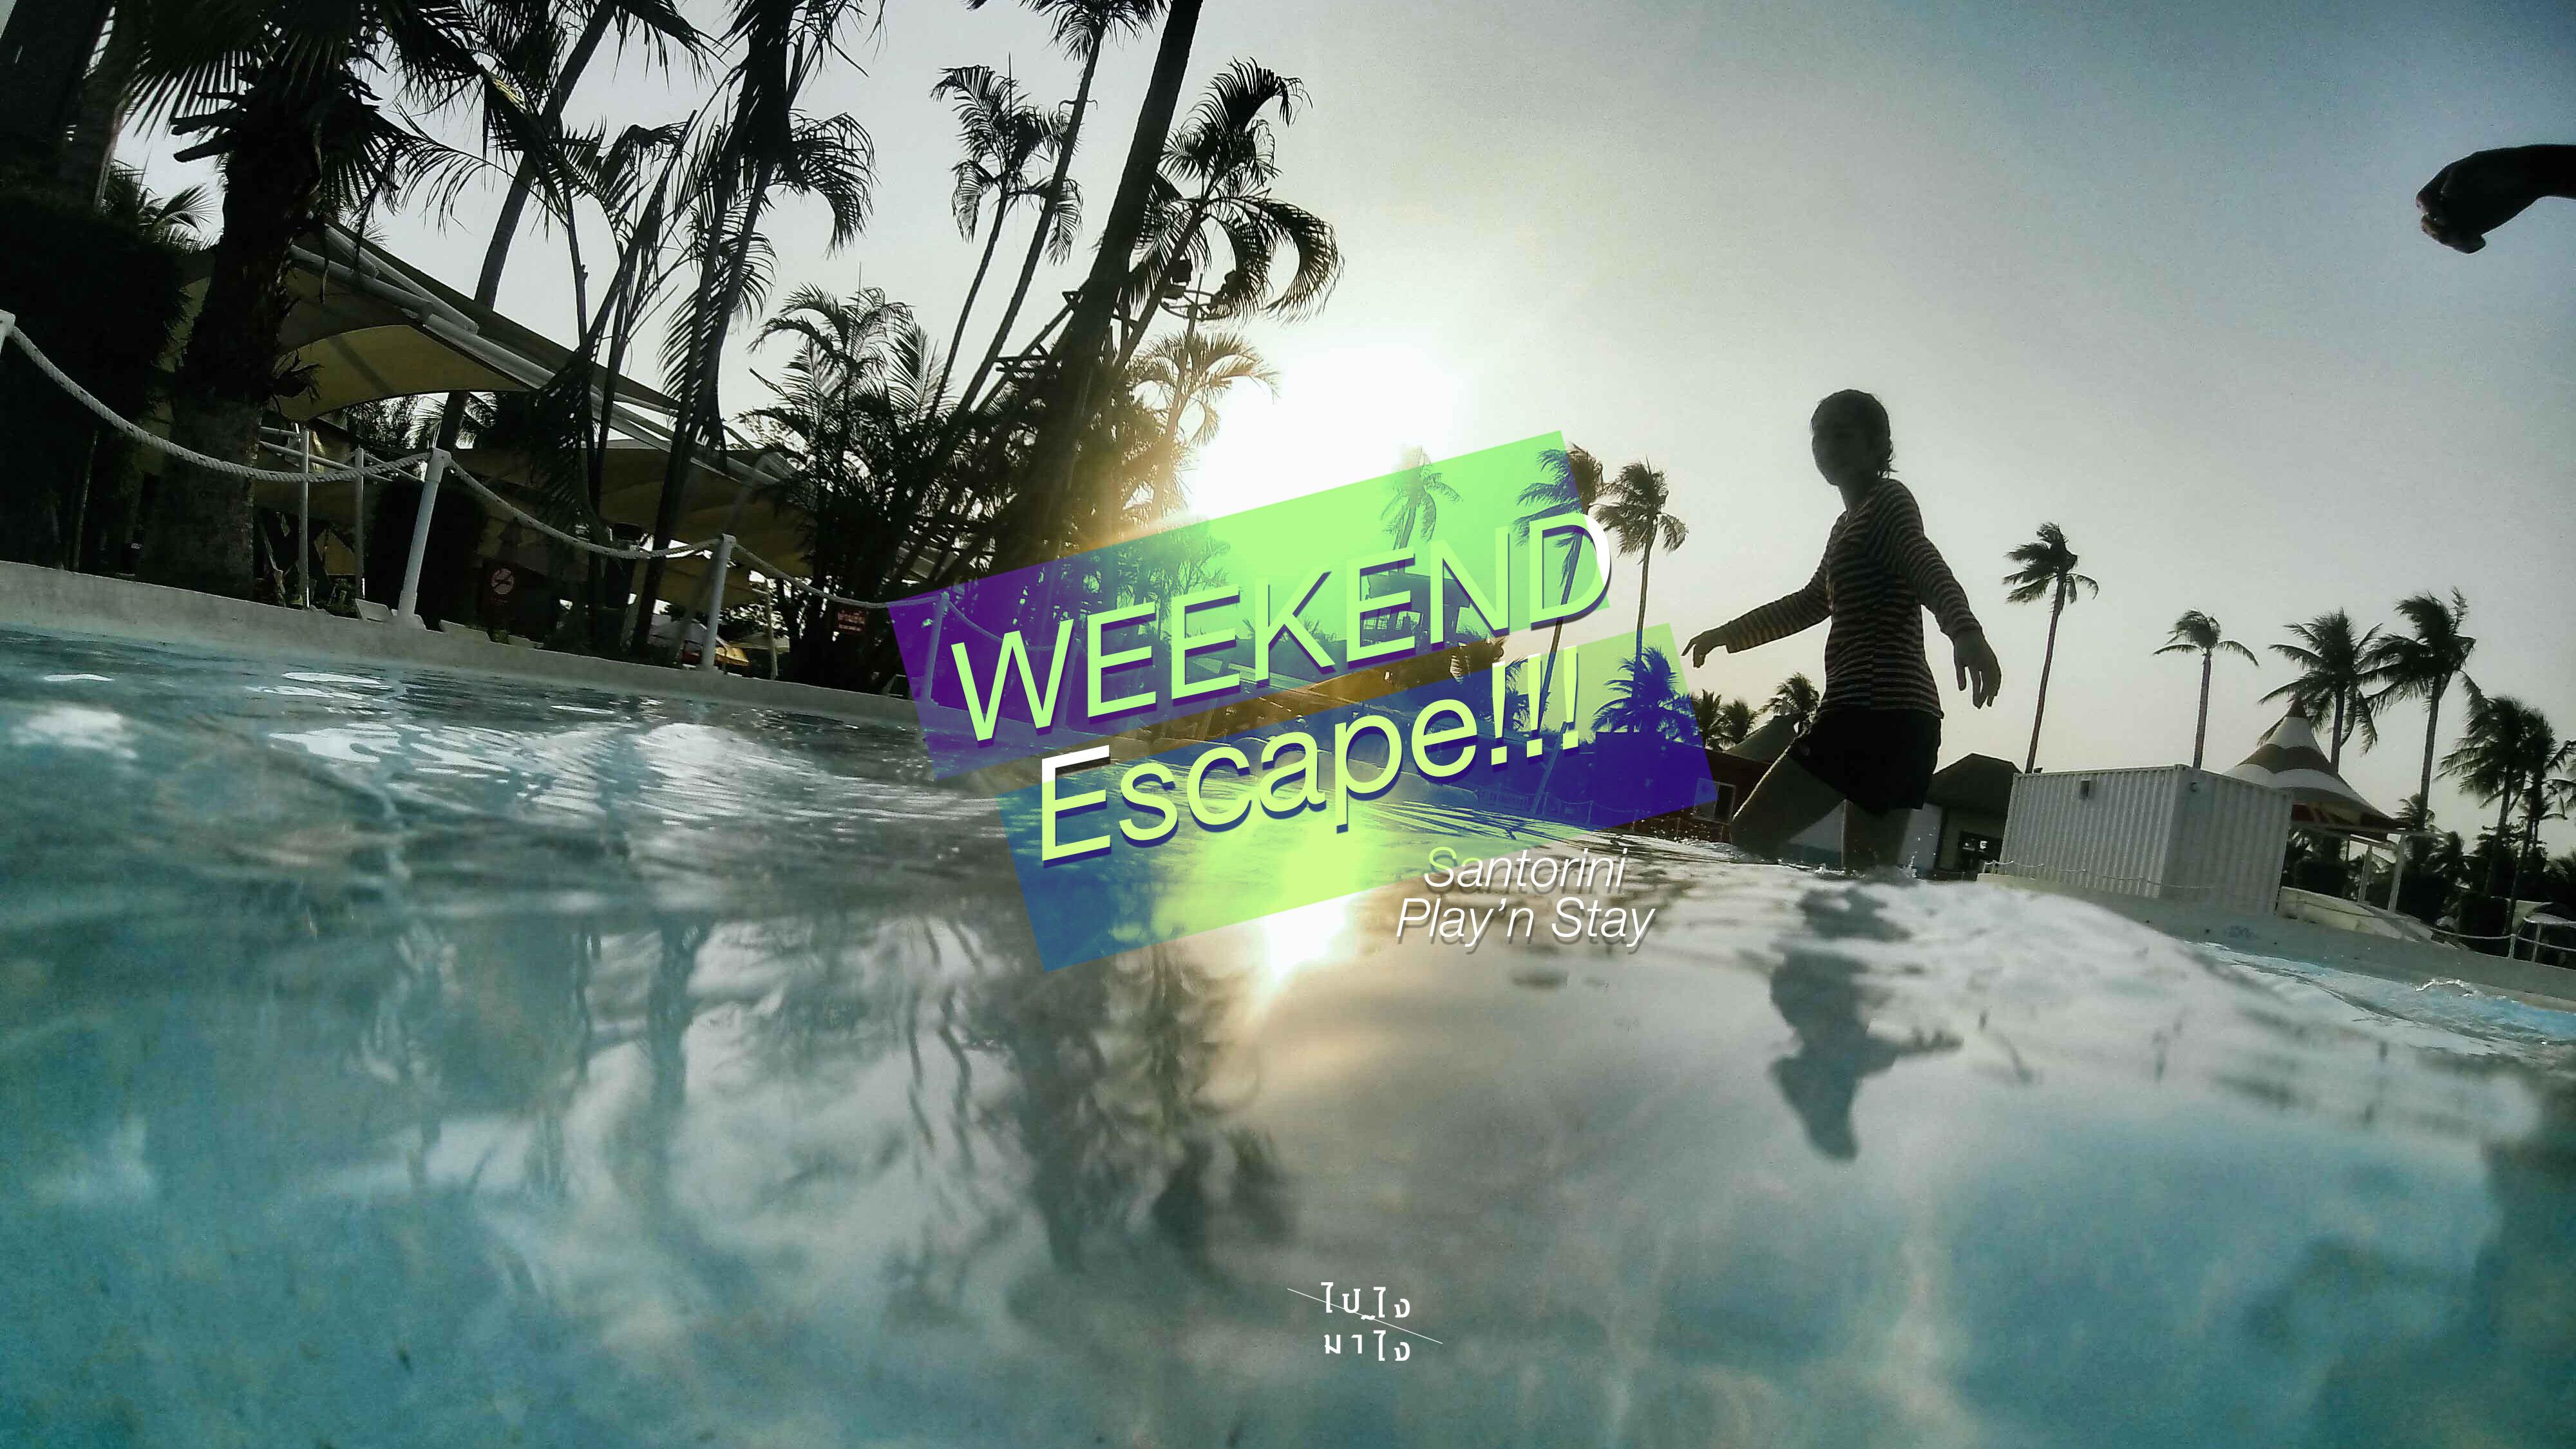 WEEKEND Escape!!!